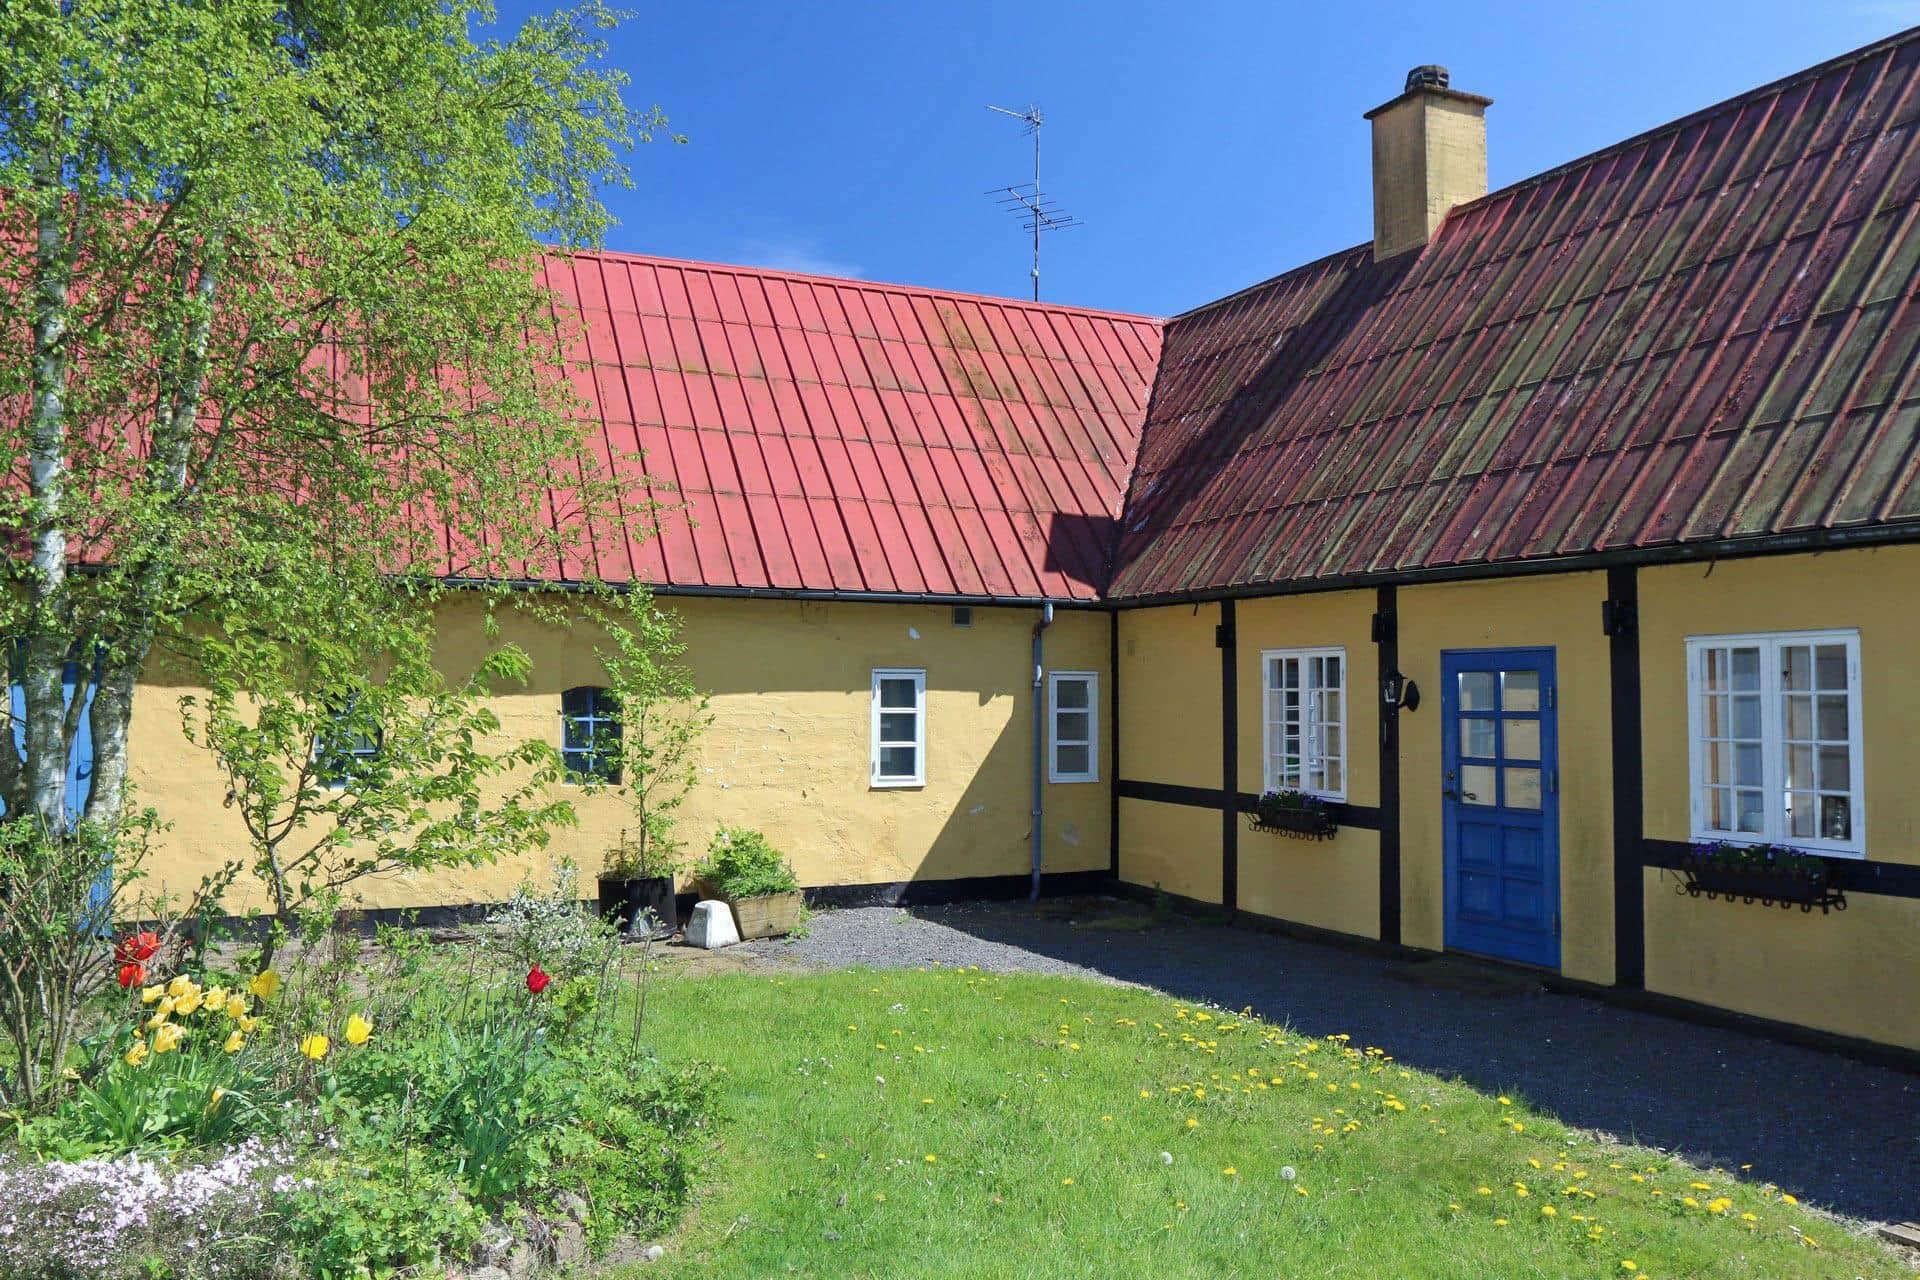 Bilde 1-10 Feirehus 3630, Kannikegårdsvej 23, DK - 3730 Nexø